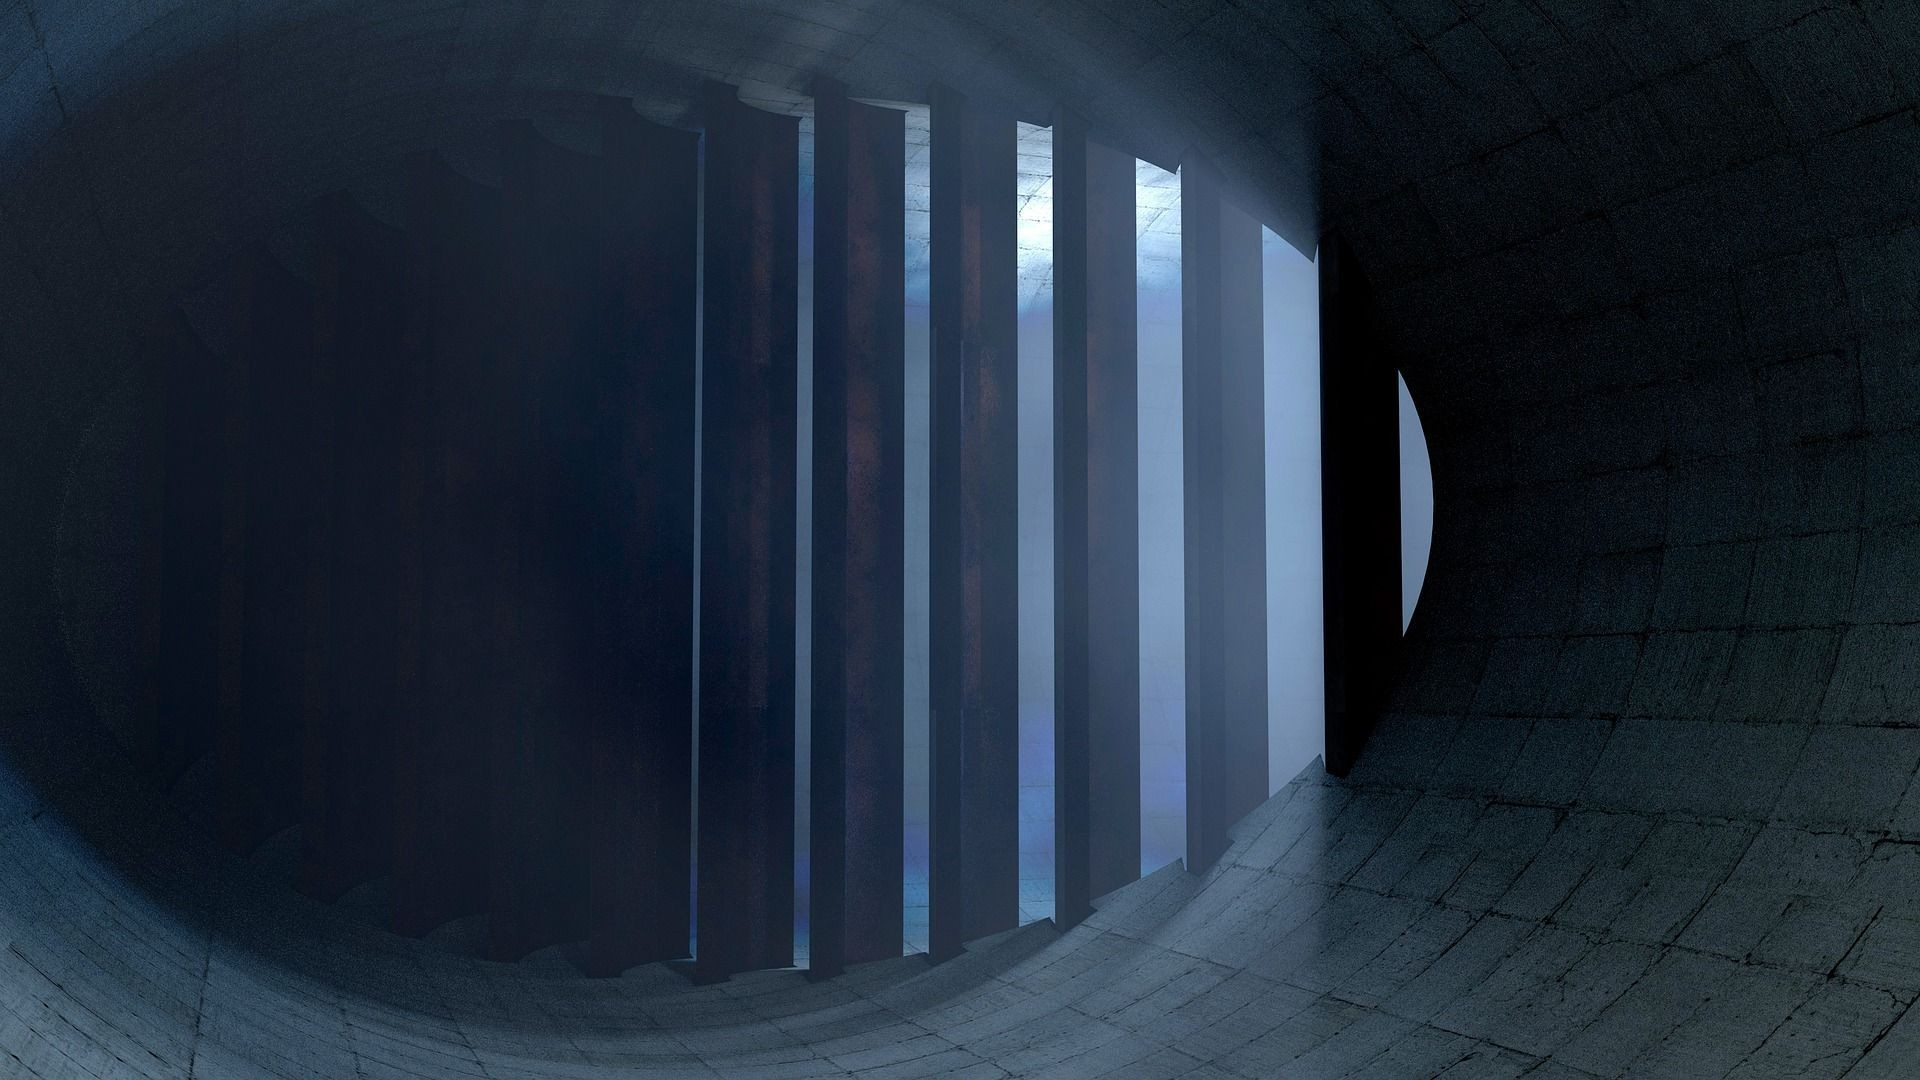 tunnel-4214236_1920